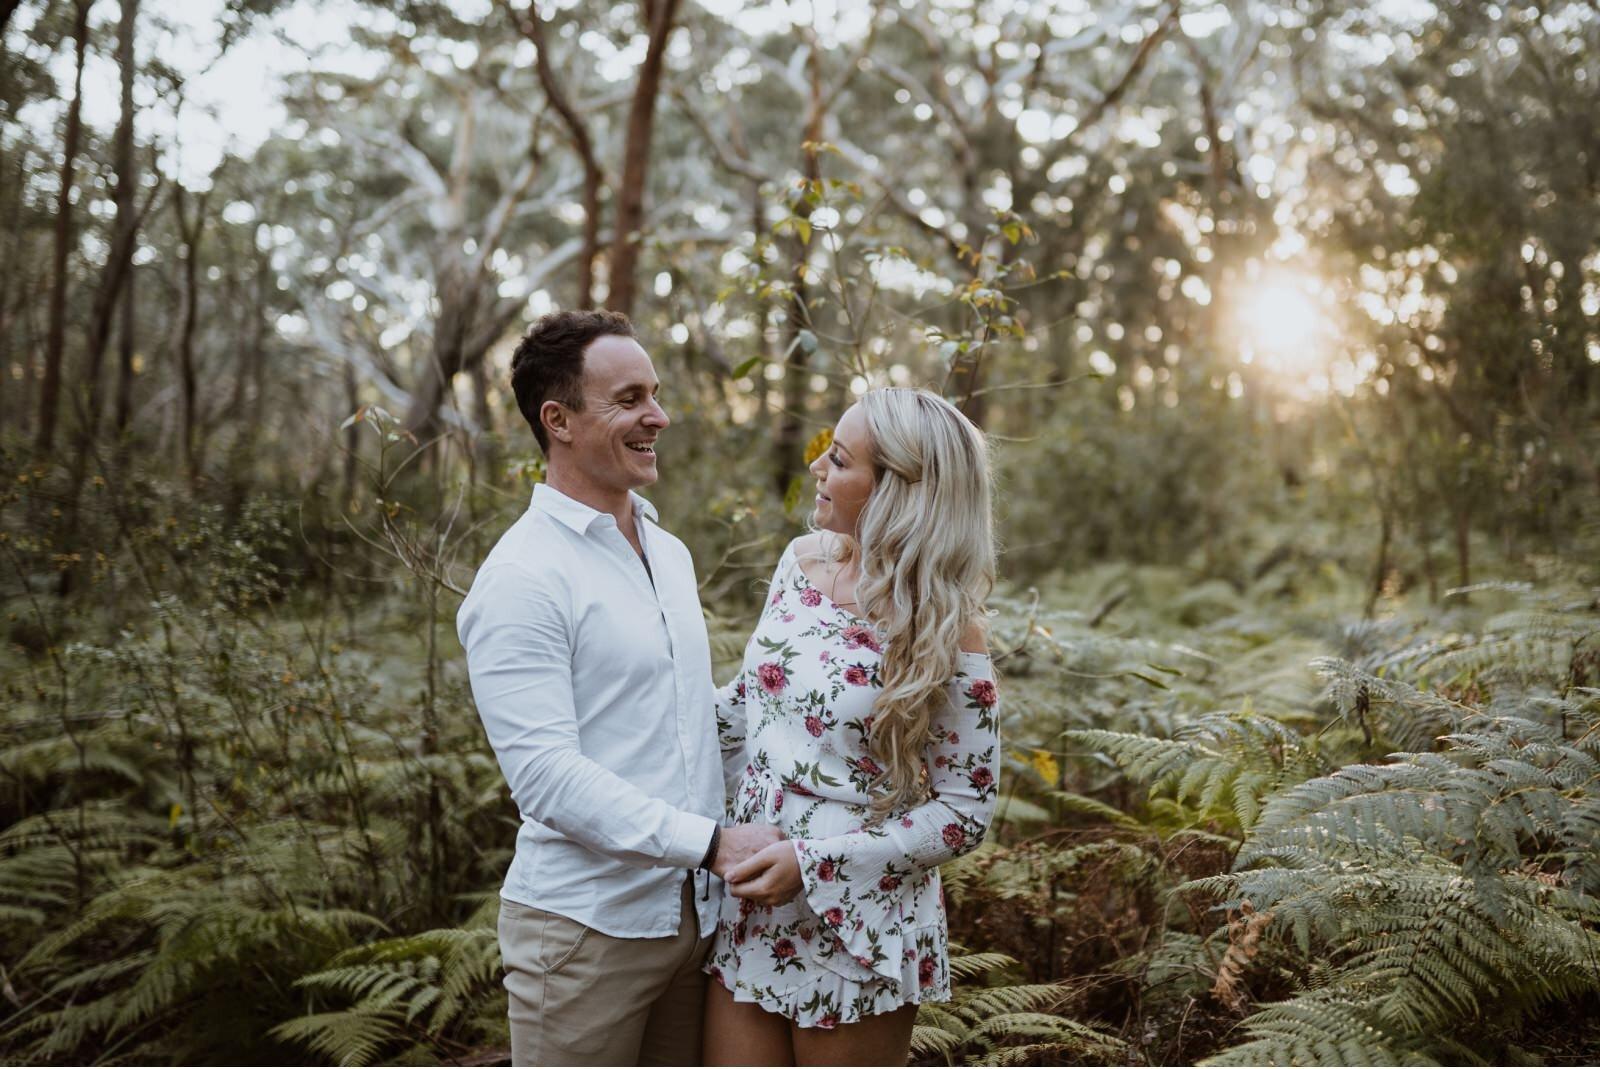 newcastle-wedding-photographer-dudley-engagement-shoot.jpg